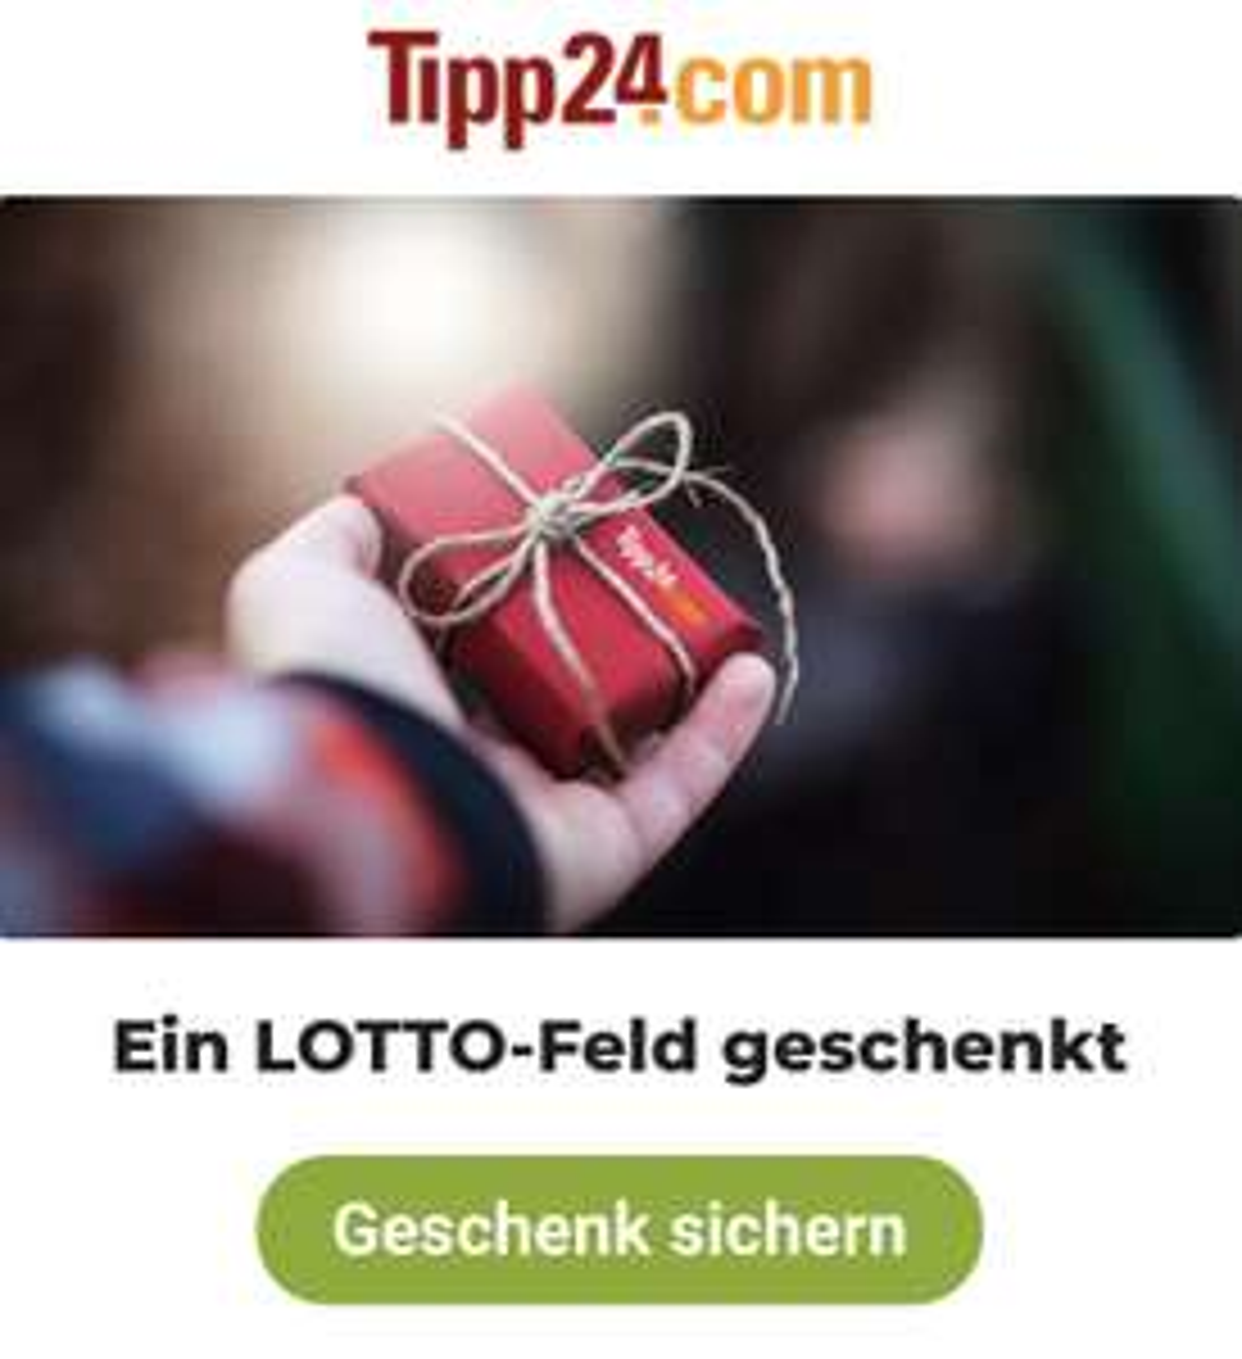 Ein LOTTO Feld geschenkt - Tipp24.com